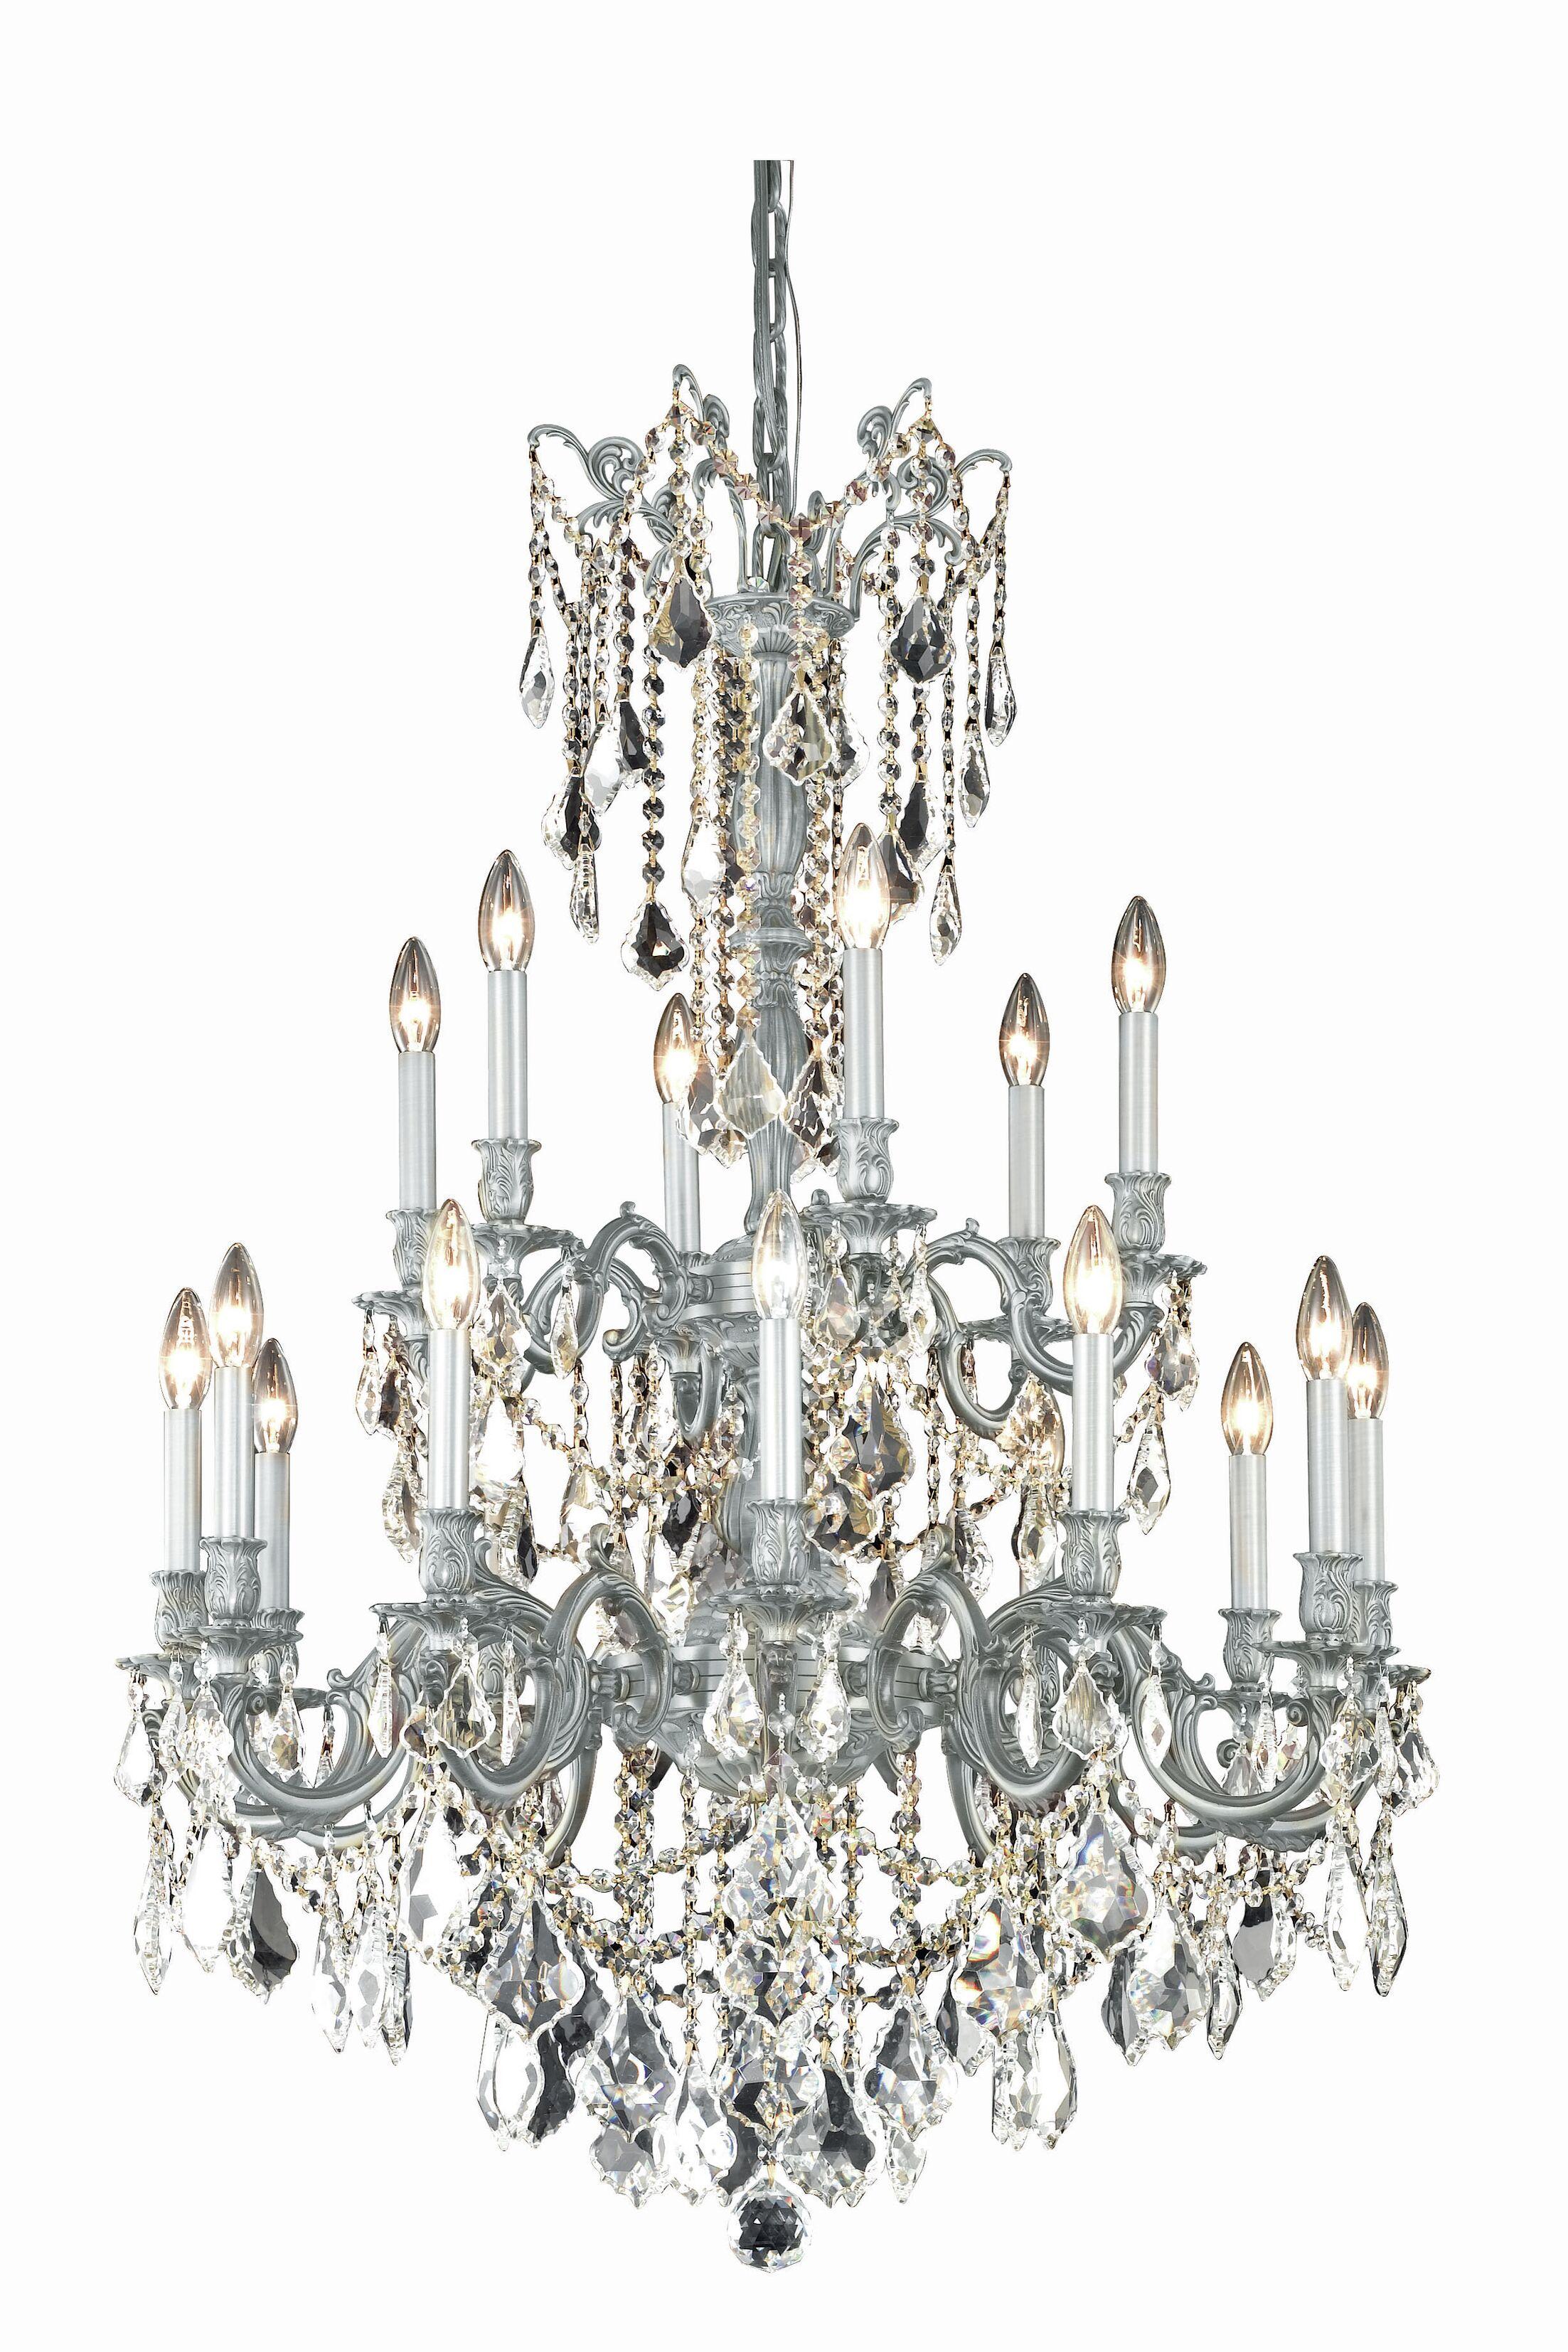 Utica 18-Light Candle Style Chandelier Crystal Grade: Spectra Swarovski, Color: Pewter